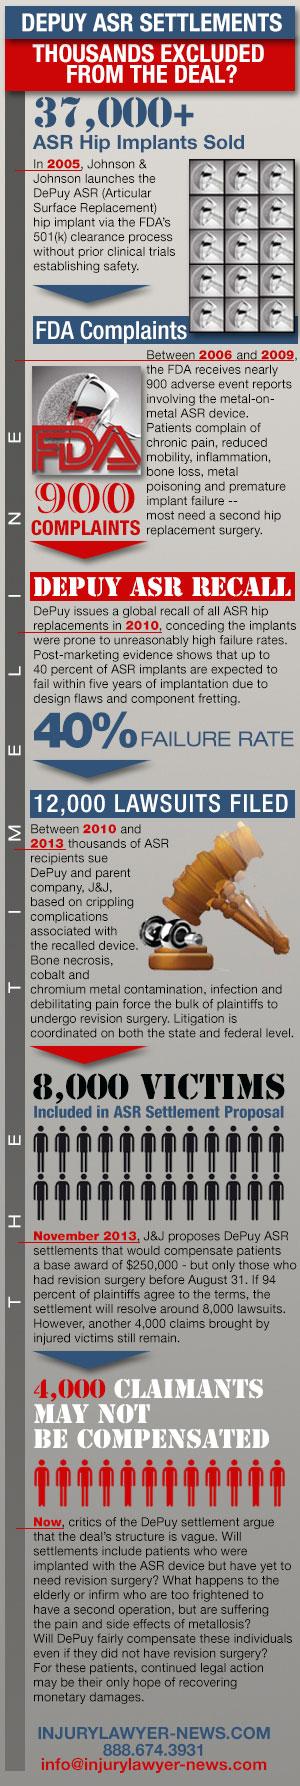 depuy infographic, depuy hip lawsuit infographic, depuy hip settlements